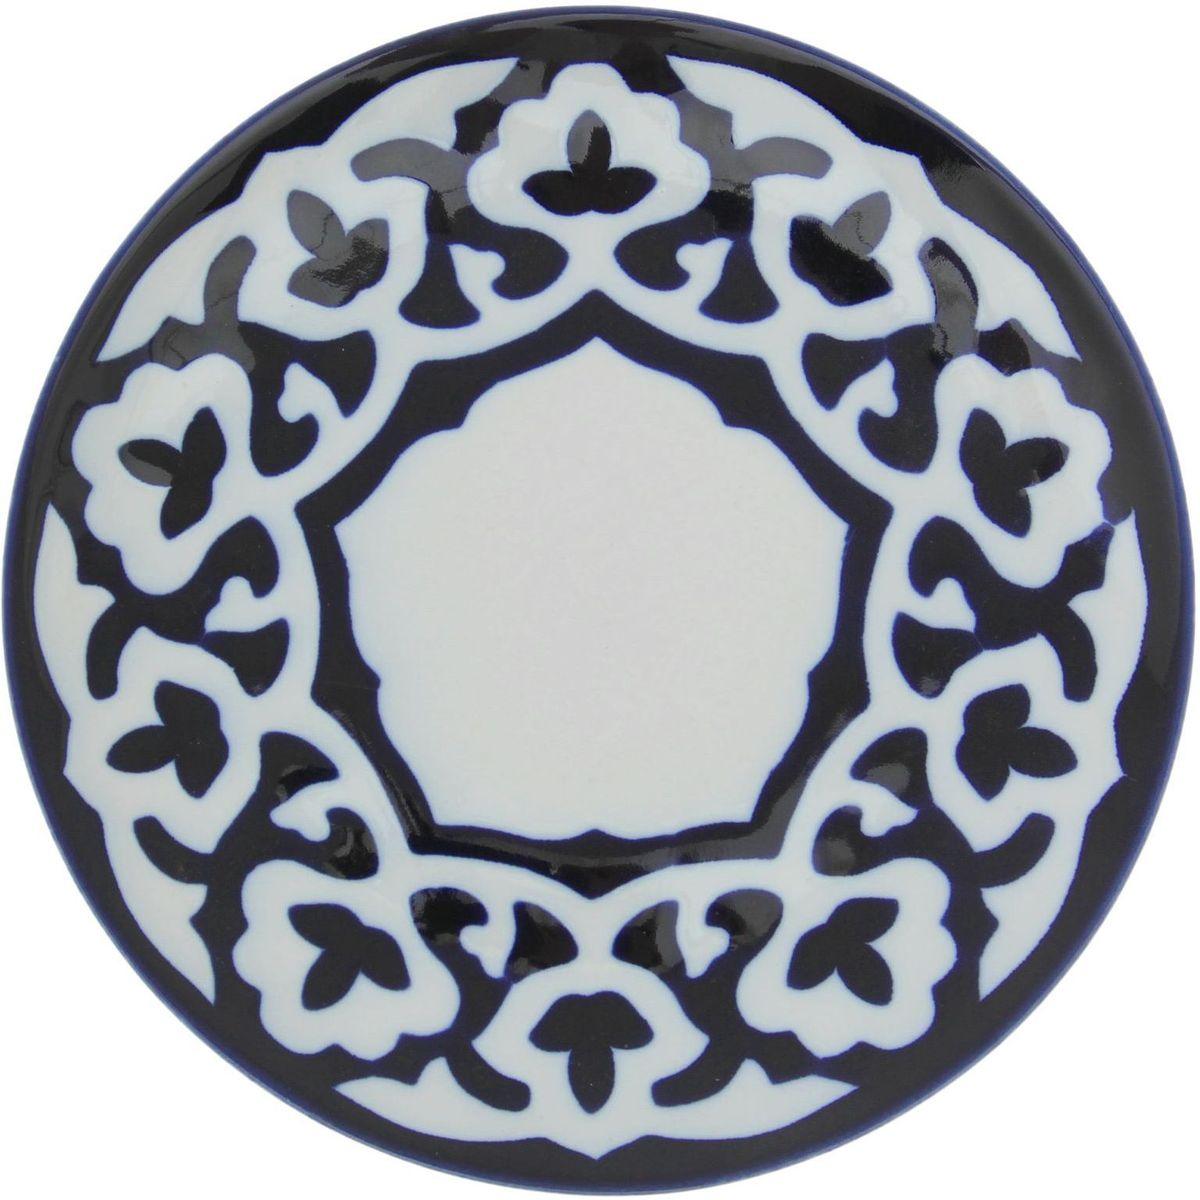 Фото - Тарелка Turon Porcelain Пахта, цвет: белый, синий, диаметр 22,5 см тарелка turon porcelain атлас цвет белый синий золотистый диаметр 22 5 см